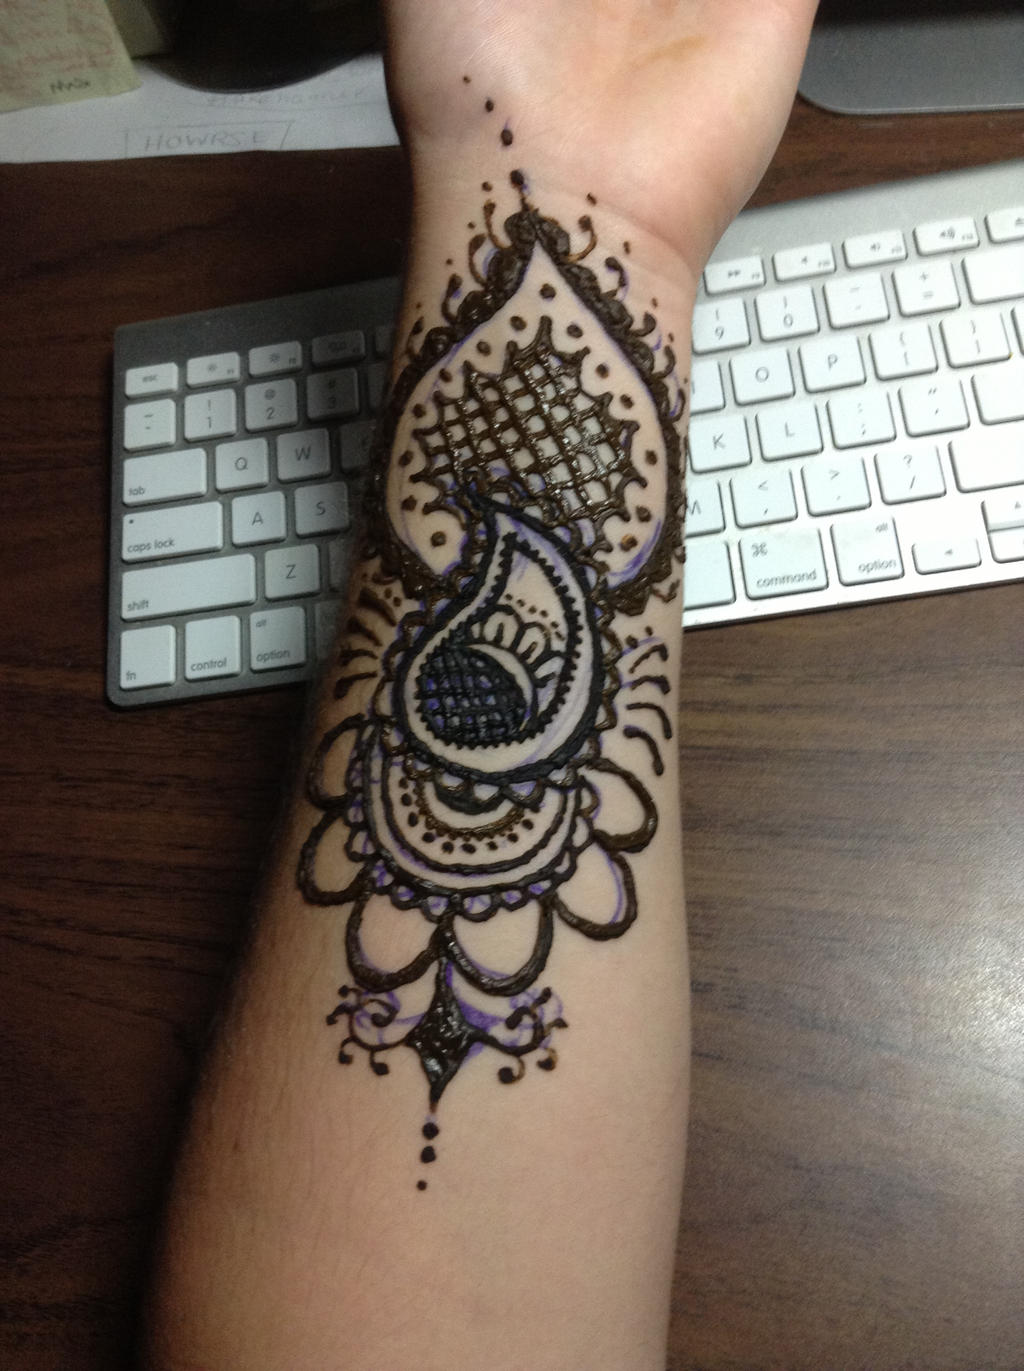 henna arm tattoo by blackwaterpanther on deviantart. Black Bedroom Furniture Sets. Home Design Ideas